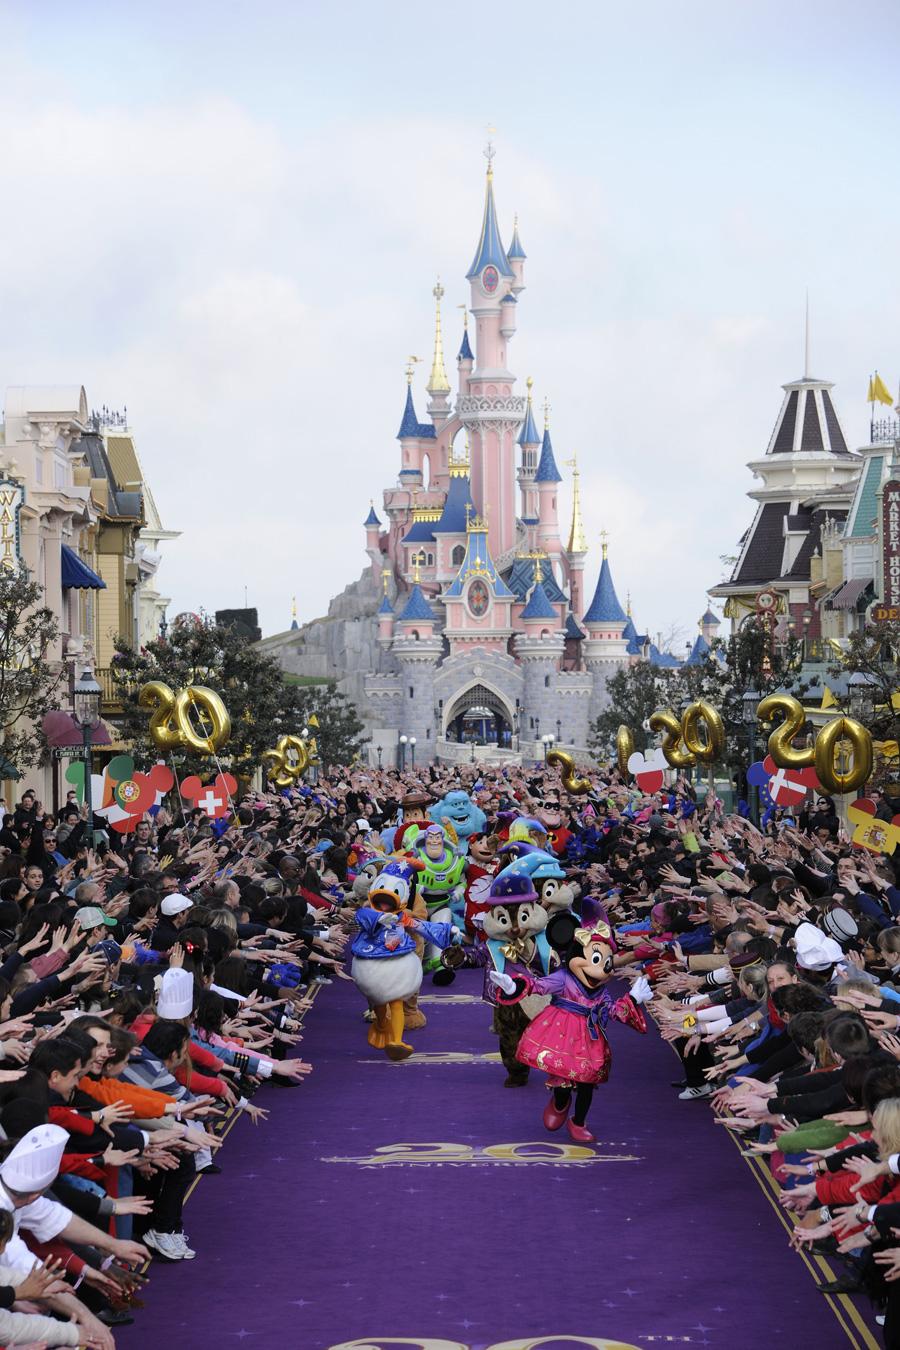 Bon Anniversaire, Disneyland Paris! | Disney Parks Blog